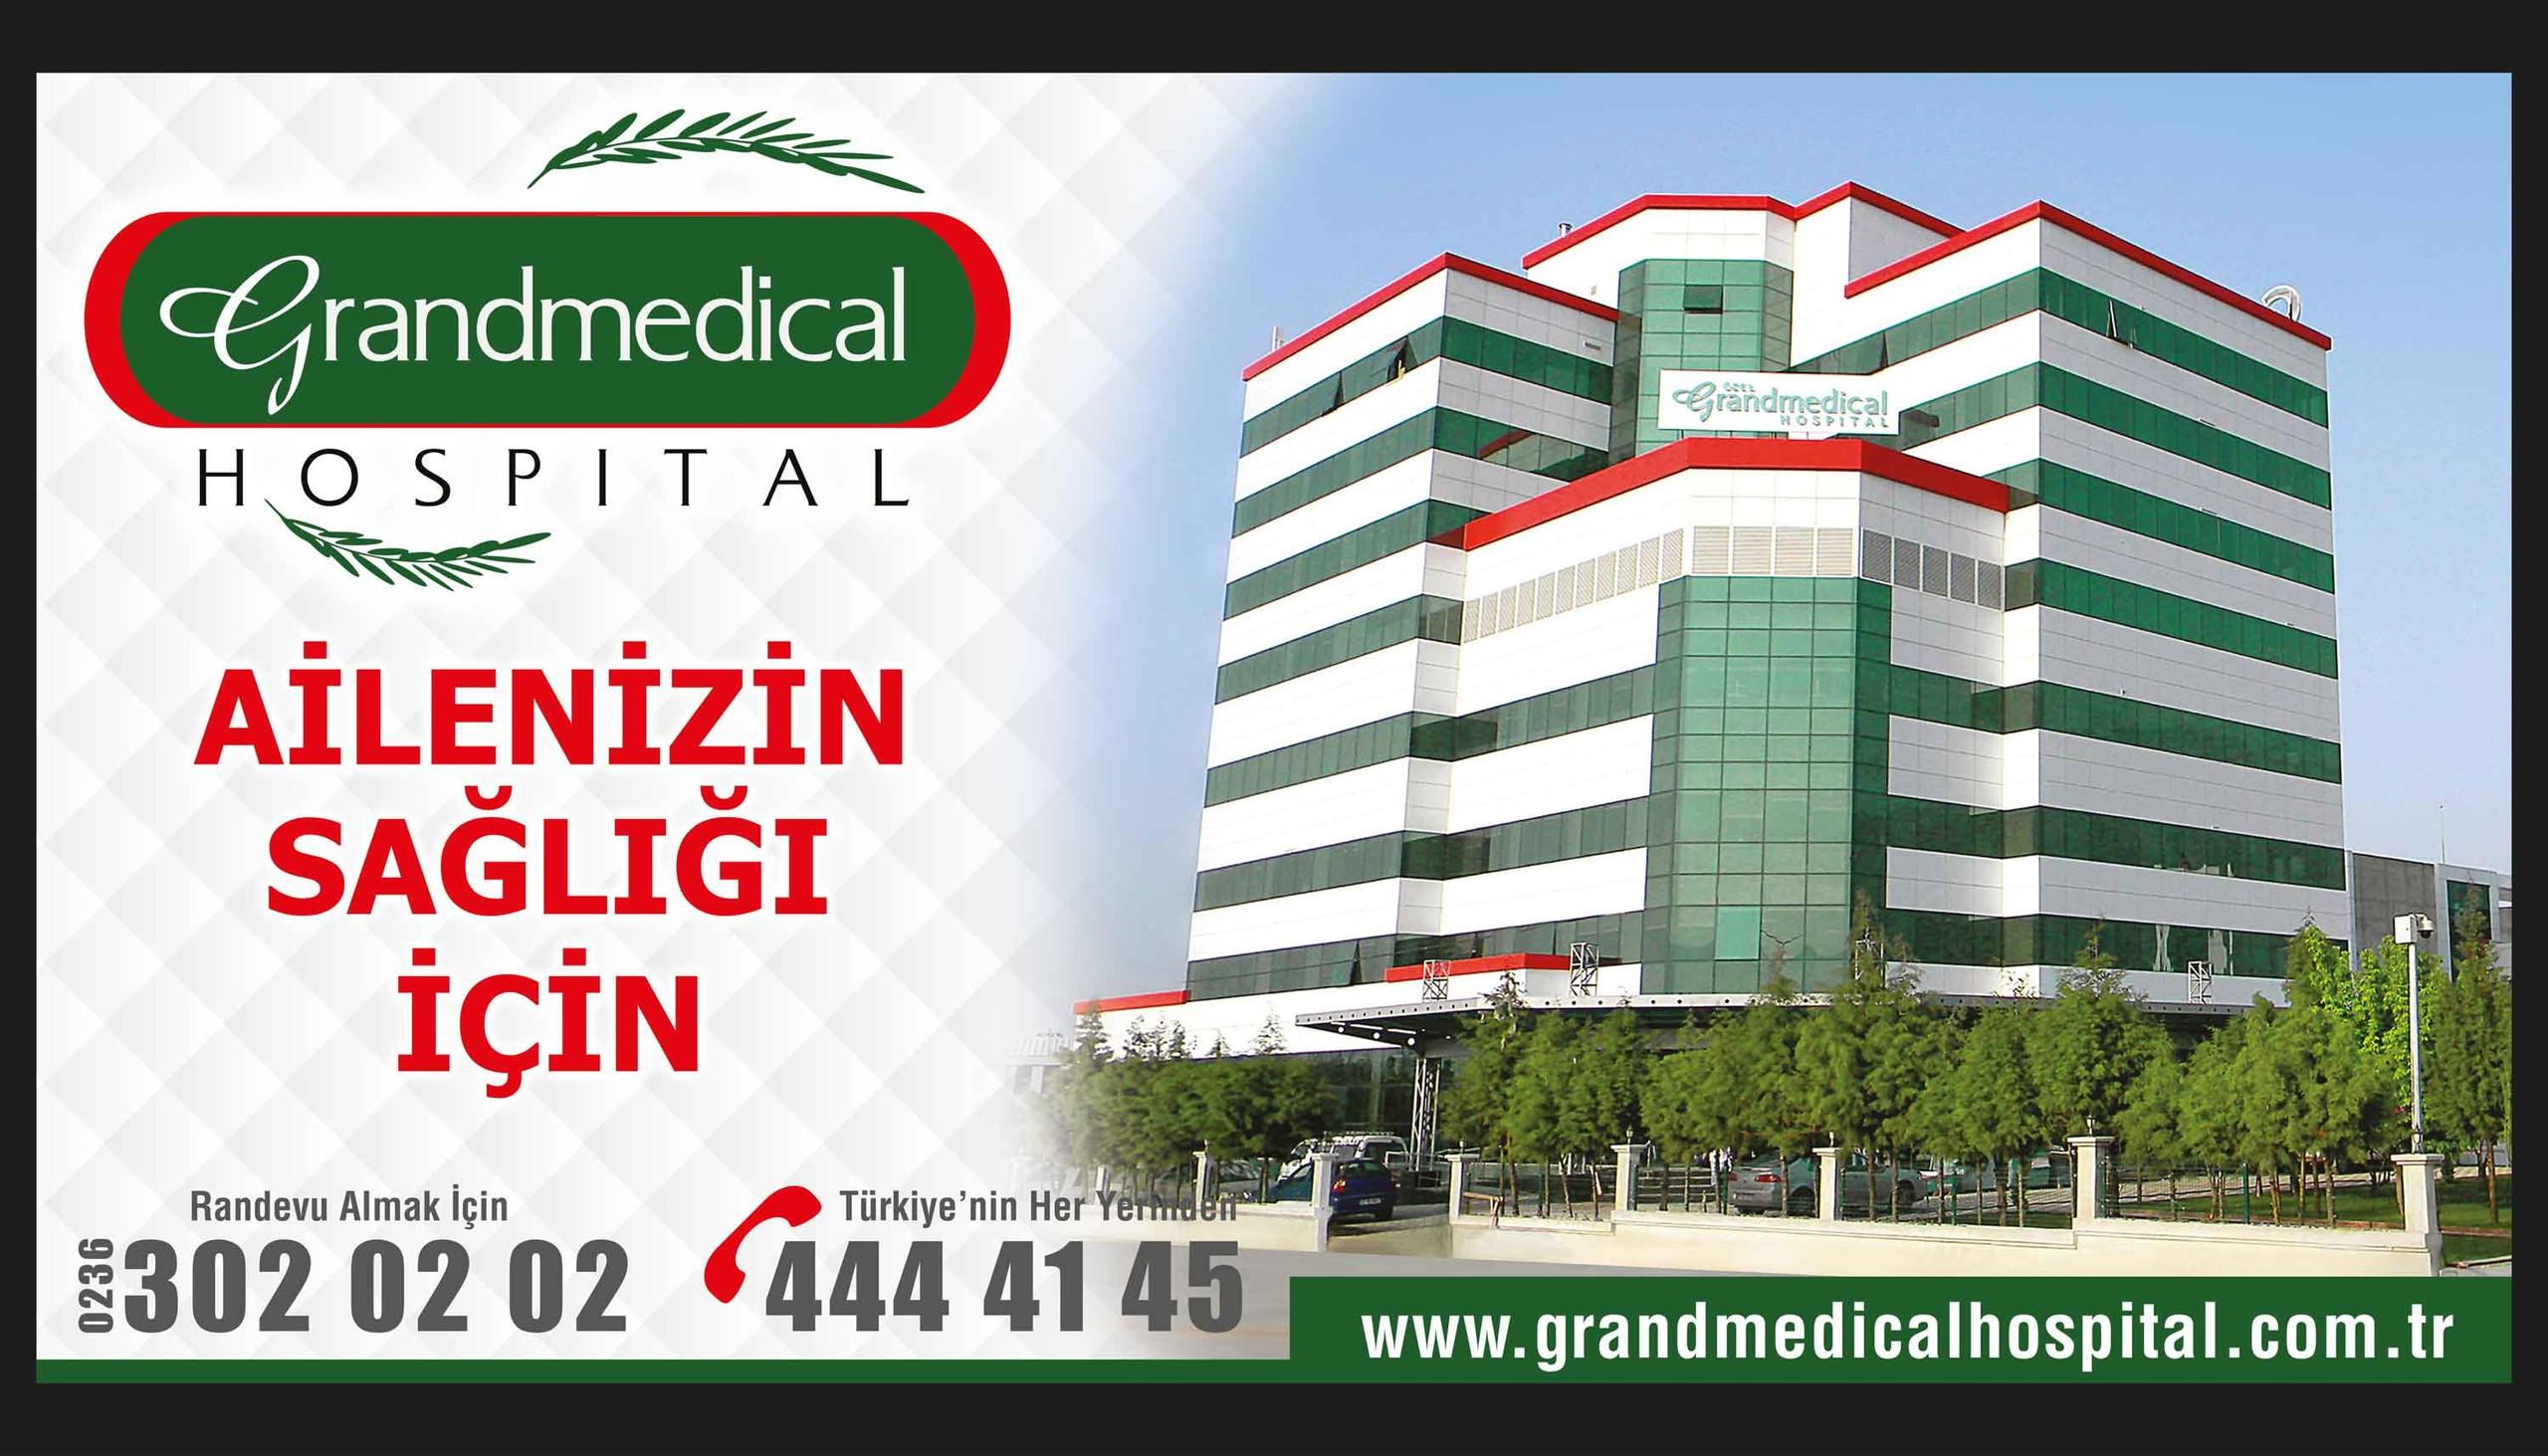 Grandmedical Hospital